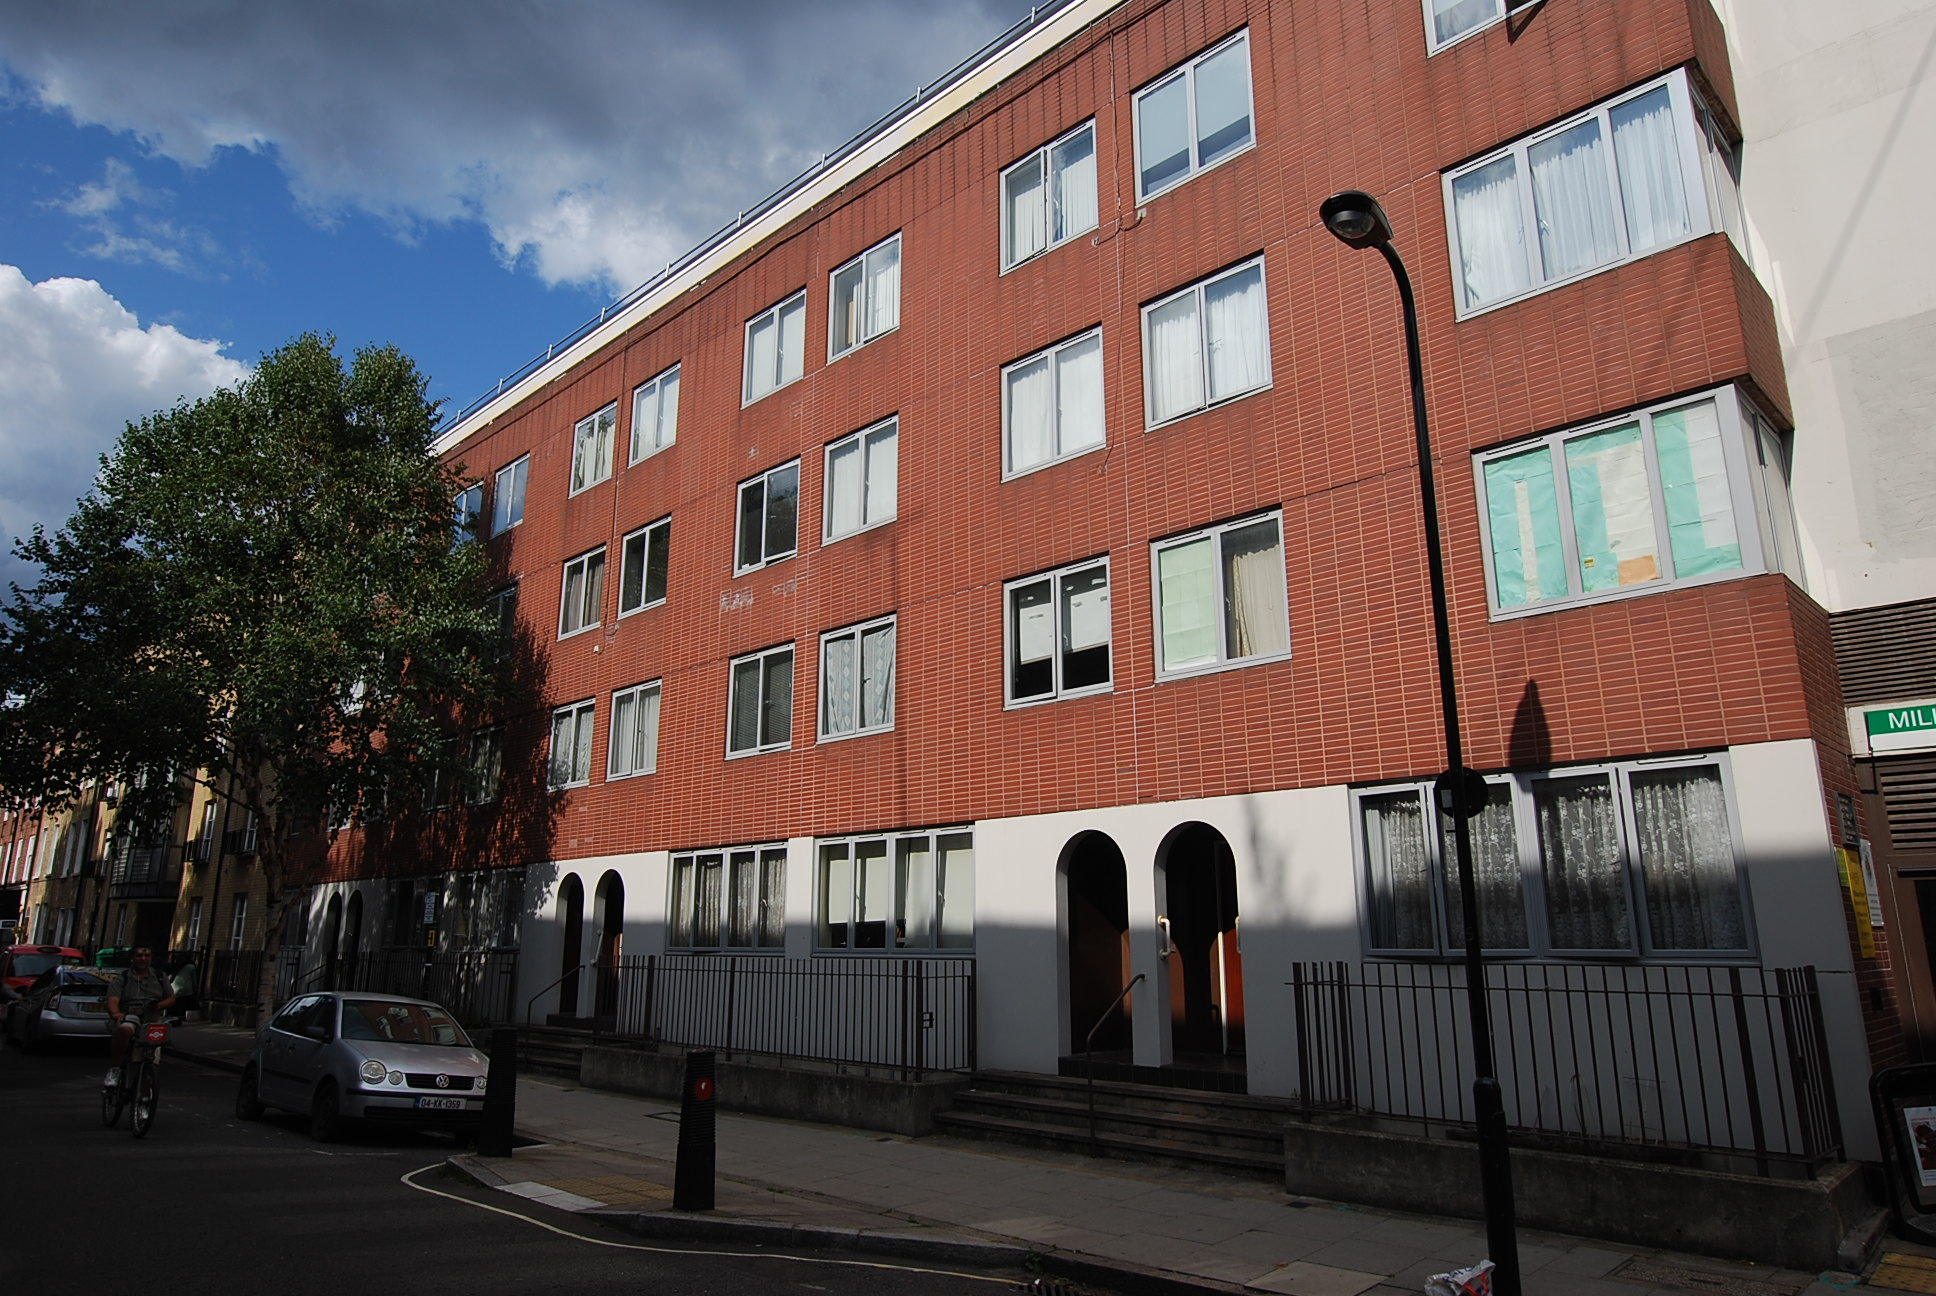 Flats to Rent Eltham, Welling, Bexleyheath &